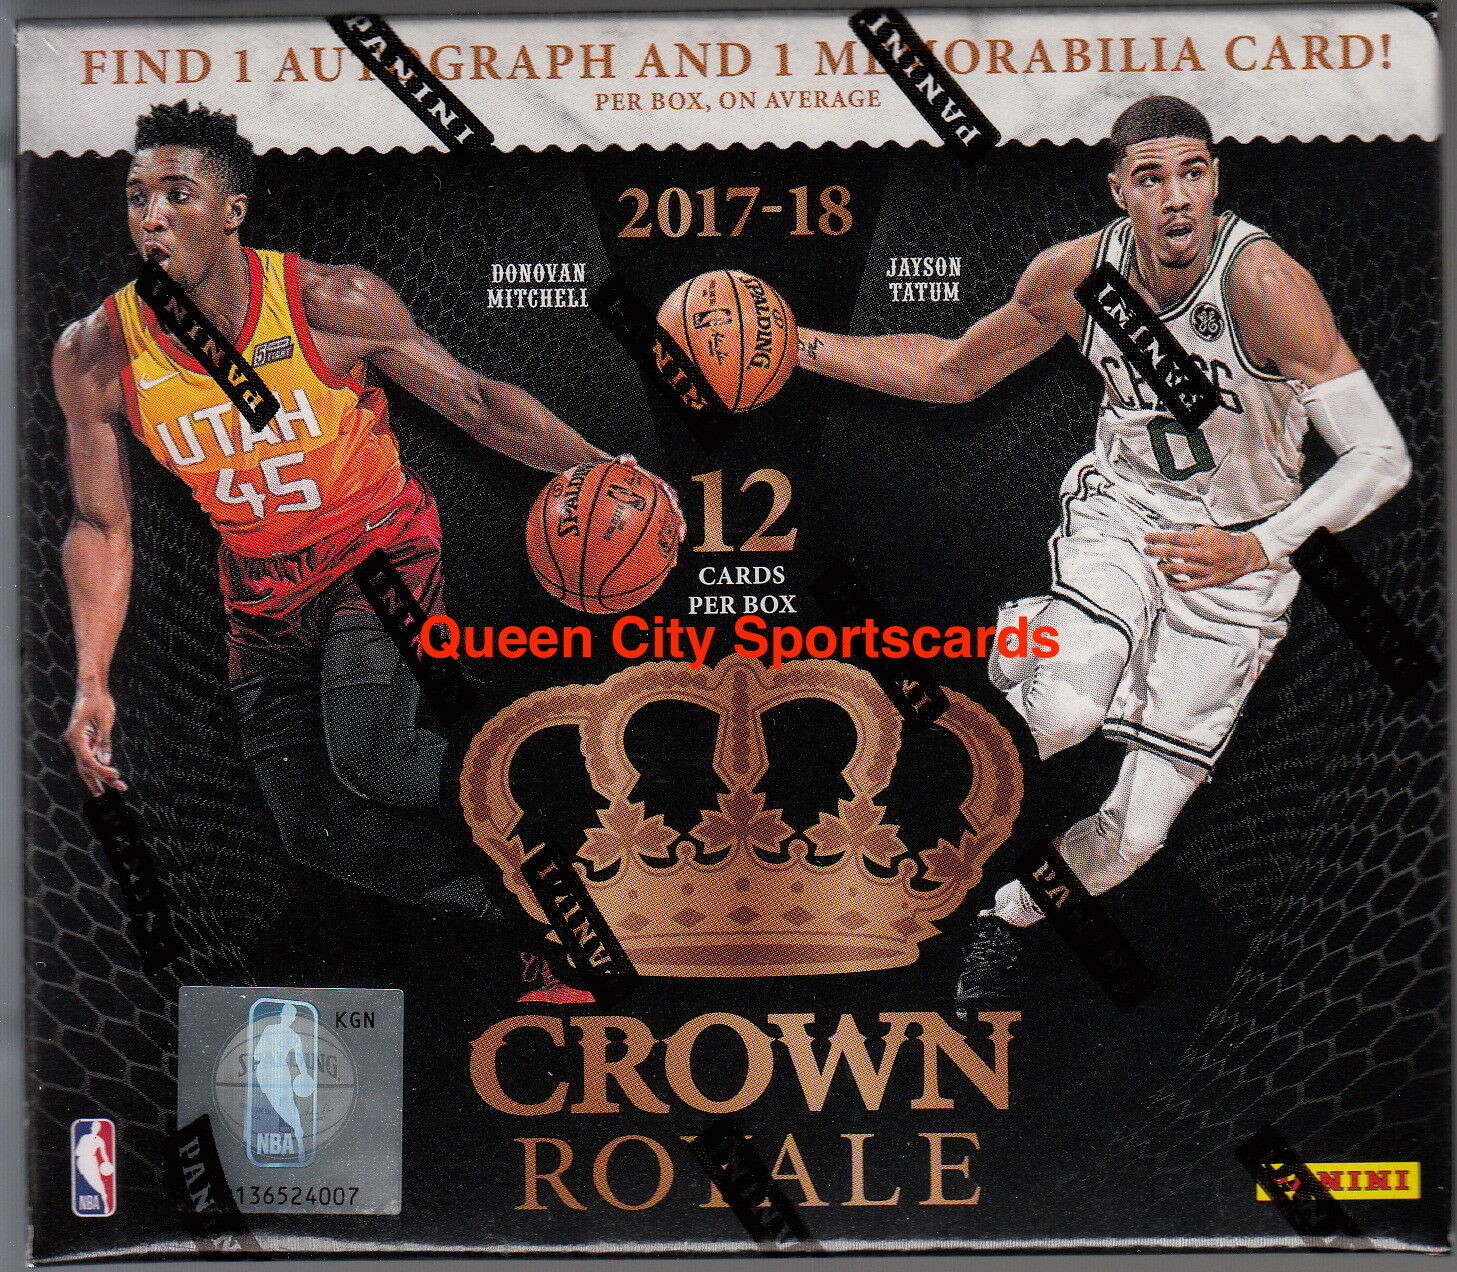 2017 18 Panini Crown Royale Basketball Factory Sealed Hobby Box